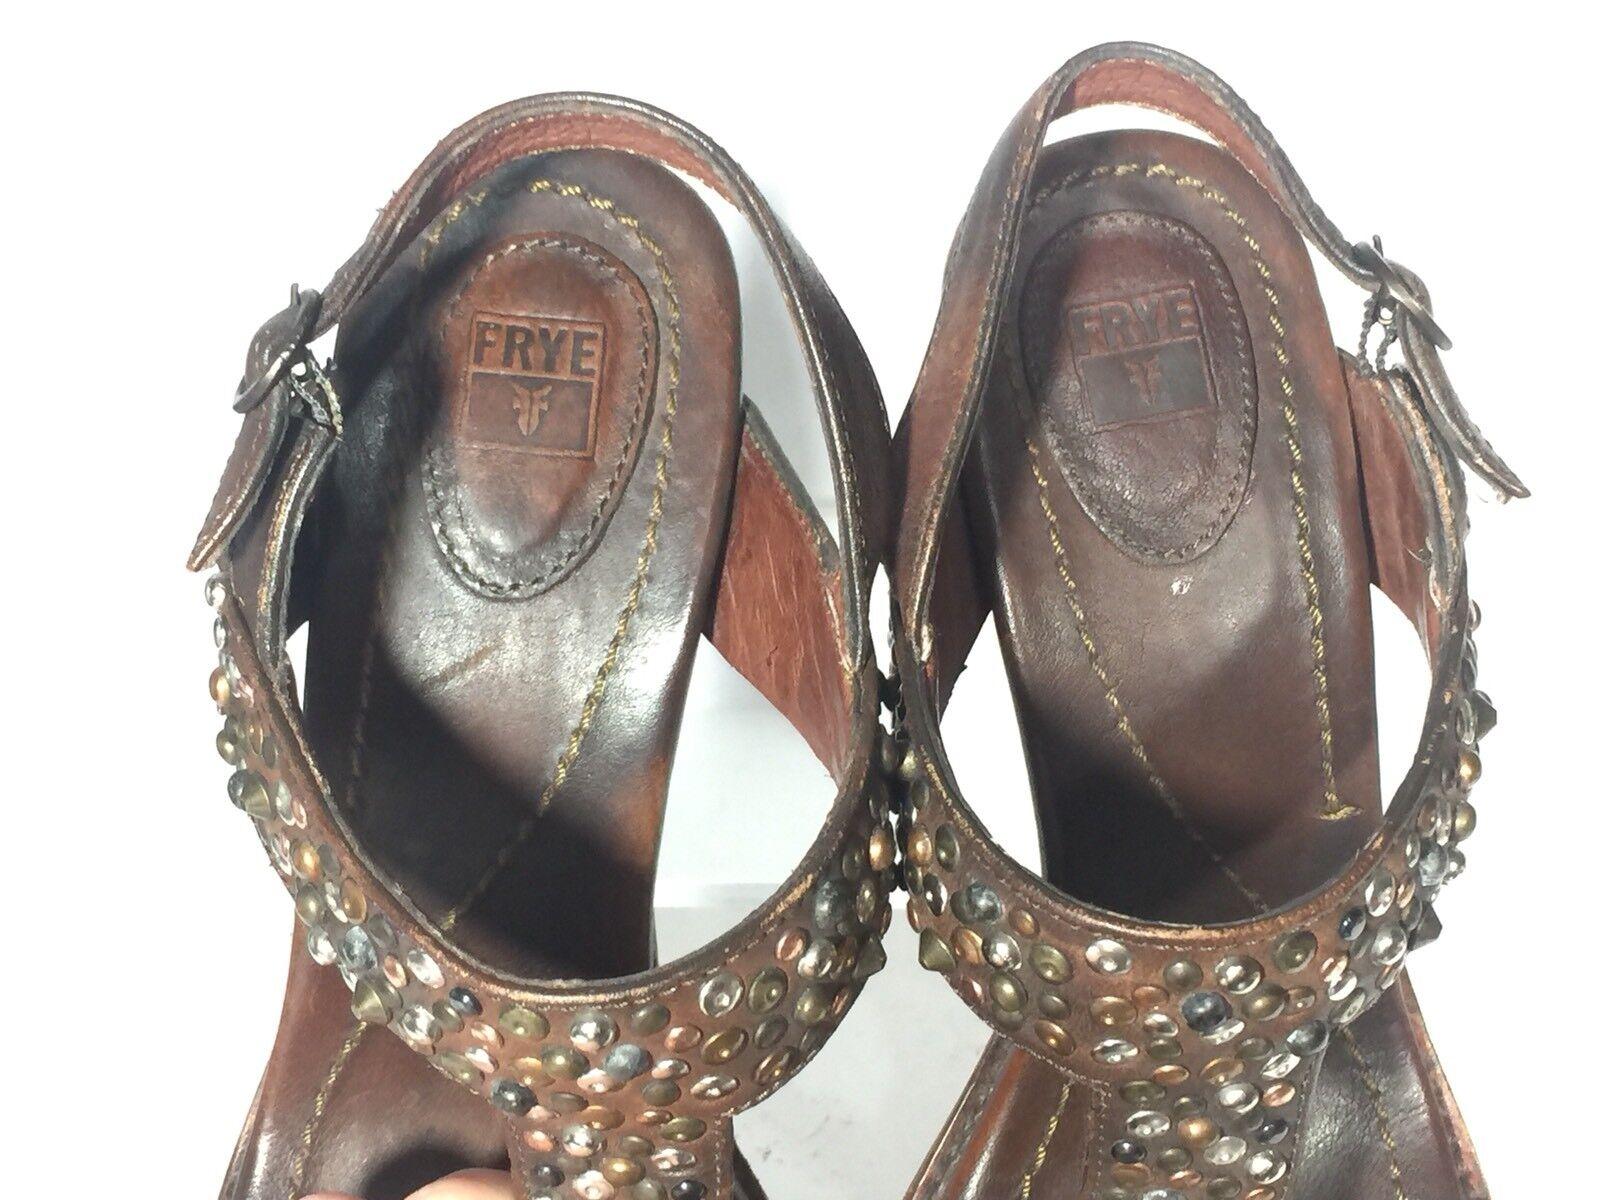 FRYE Joy Leder Vintage Studded T Strap Sz Braun Leder Platform Sandales Sz Strap 7.5 541628